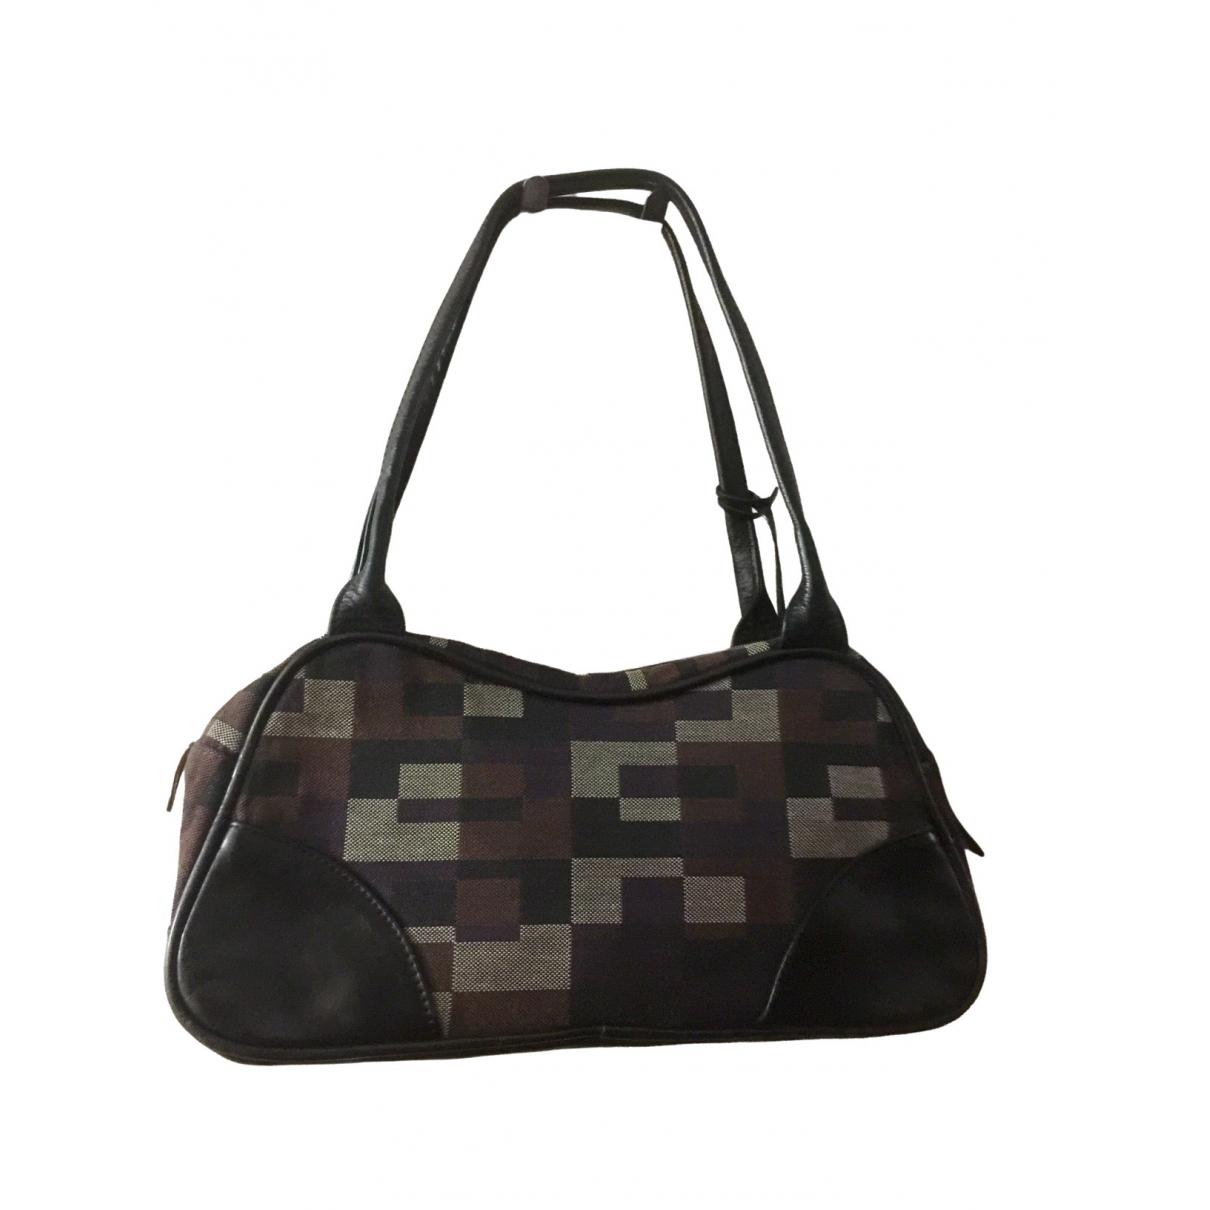 Russell & Bromley \N Handtasche in  Bunt Leinen